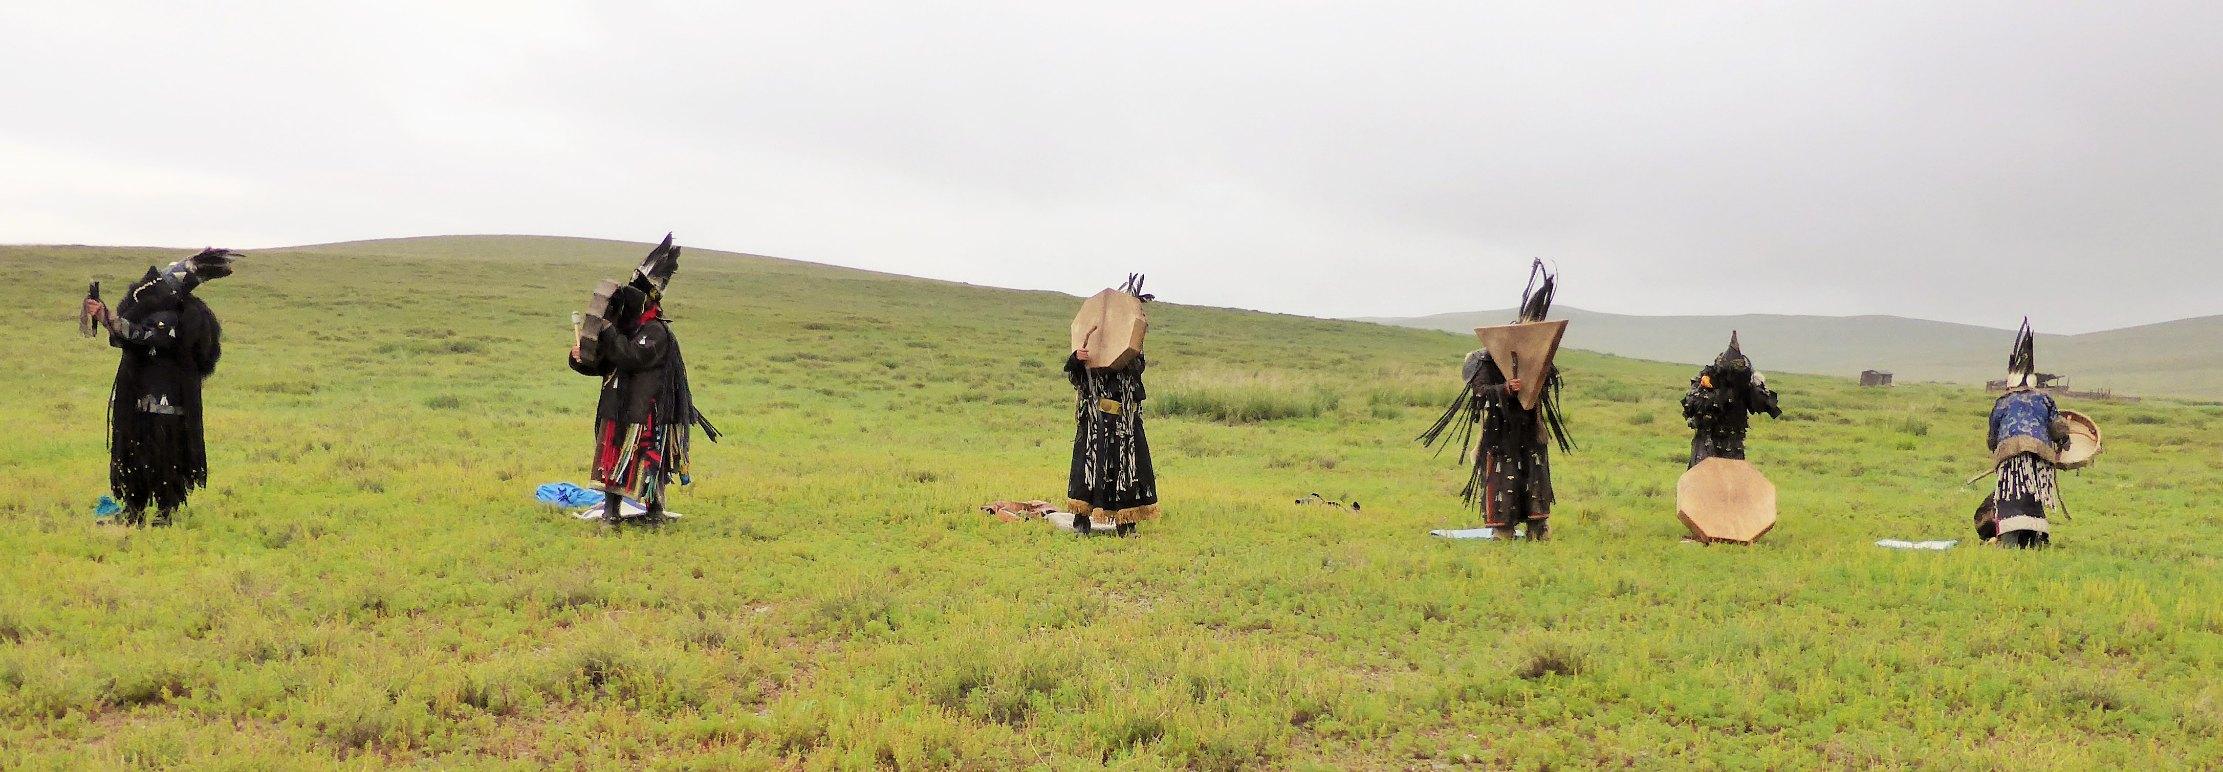 shamas mongols